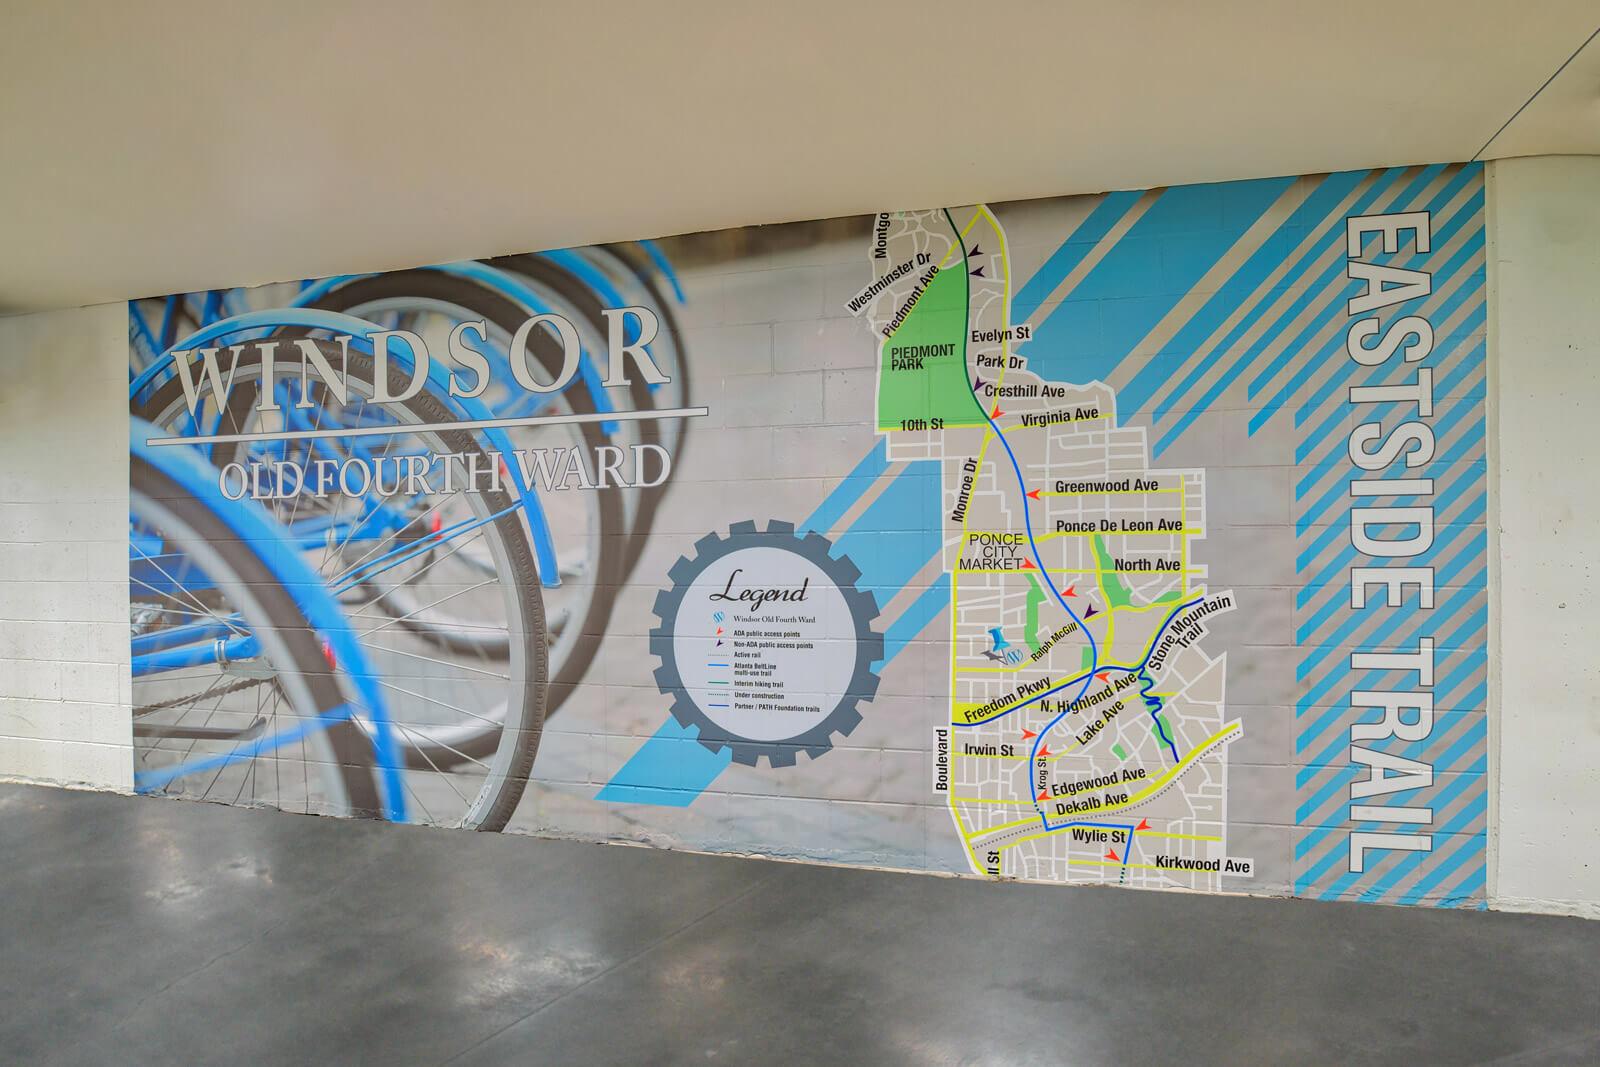 Windsor Old Fourth Ward